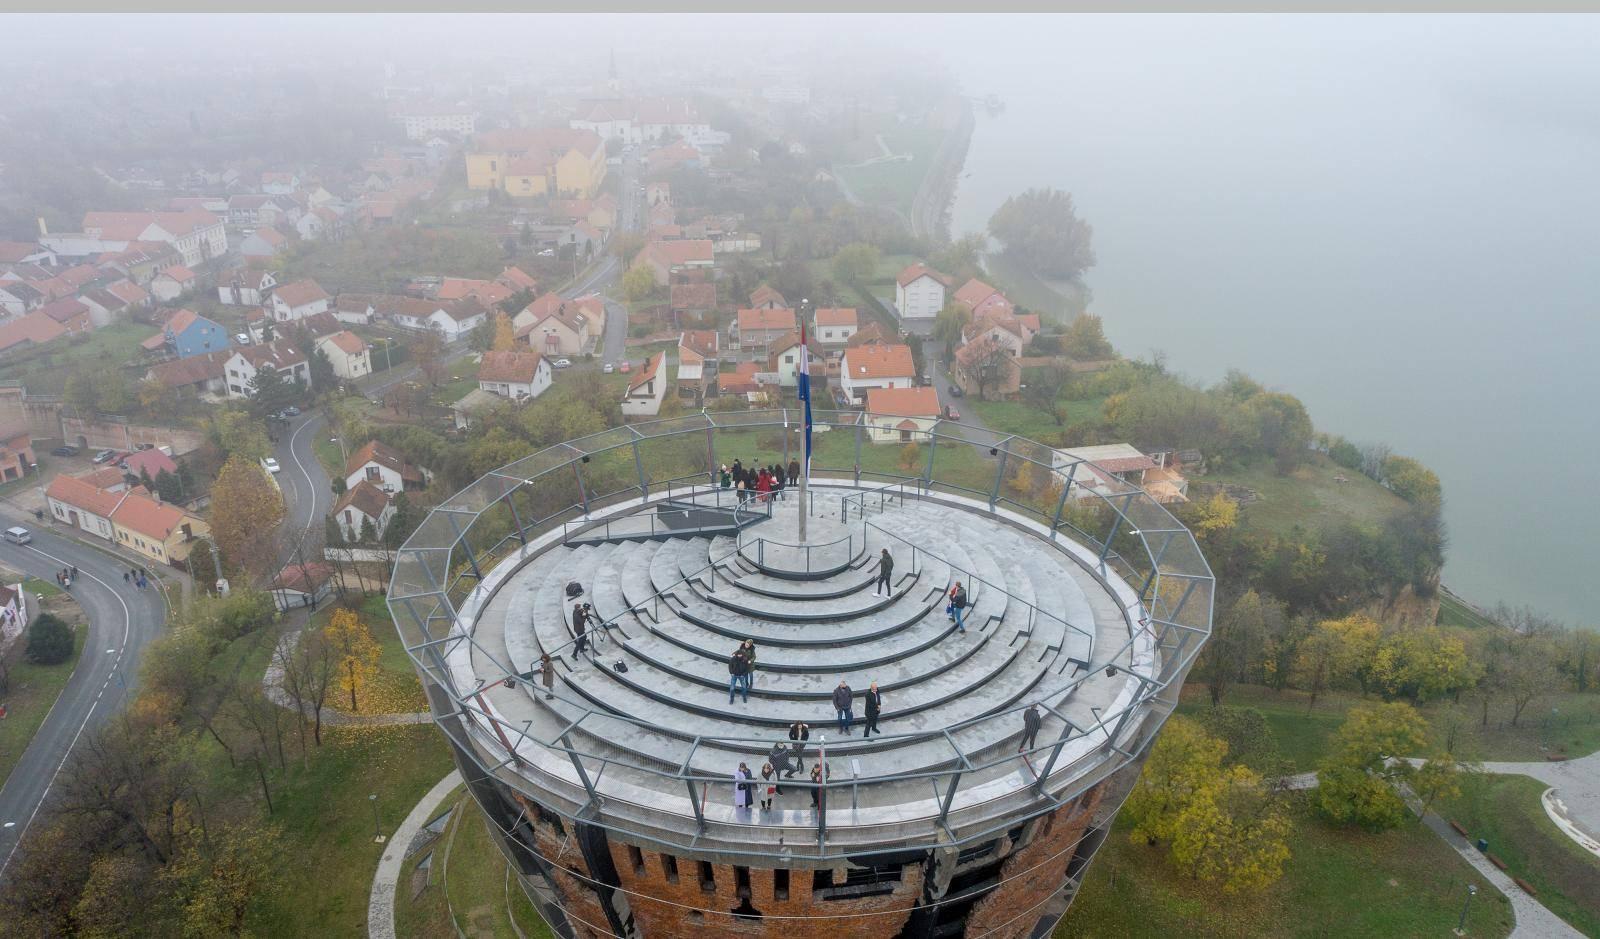 Slike iz zraka: Veliki interes za ulazak u obnovljeni Vodotoranj